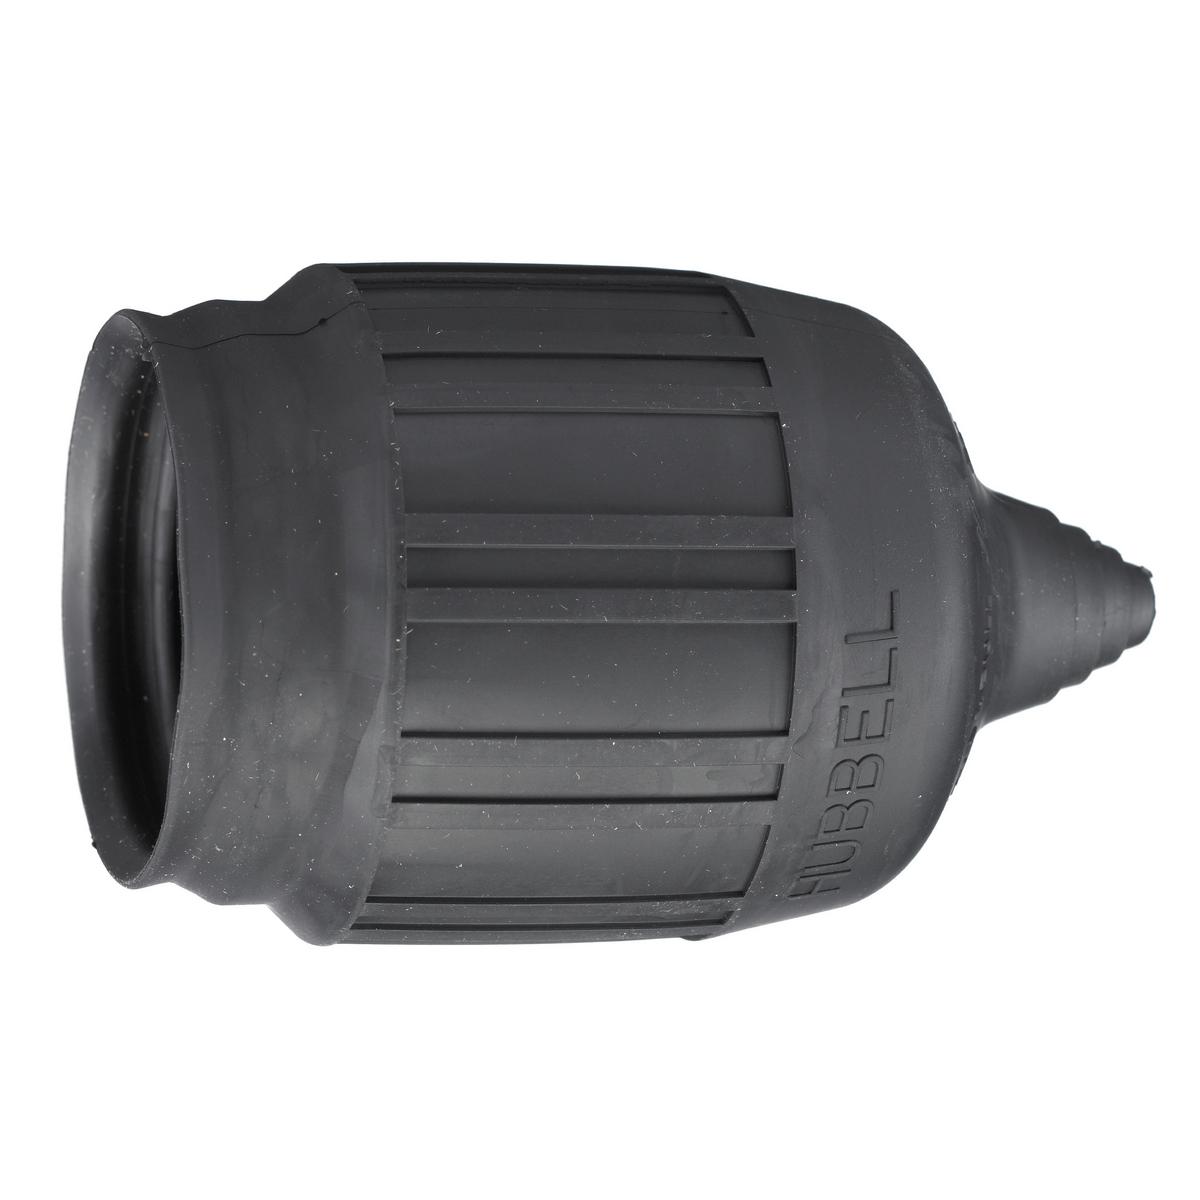 Hubbell HBL6031 Twist-Lock Black Weatherproof Seal-Tite Boot